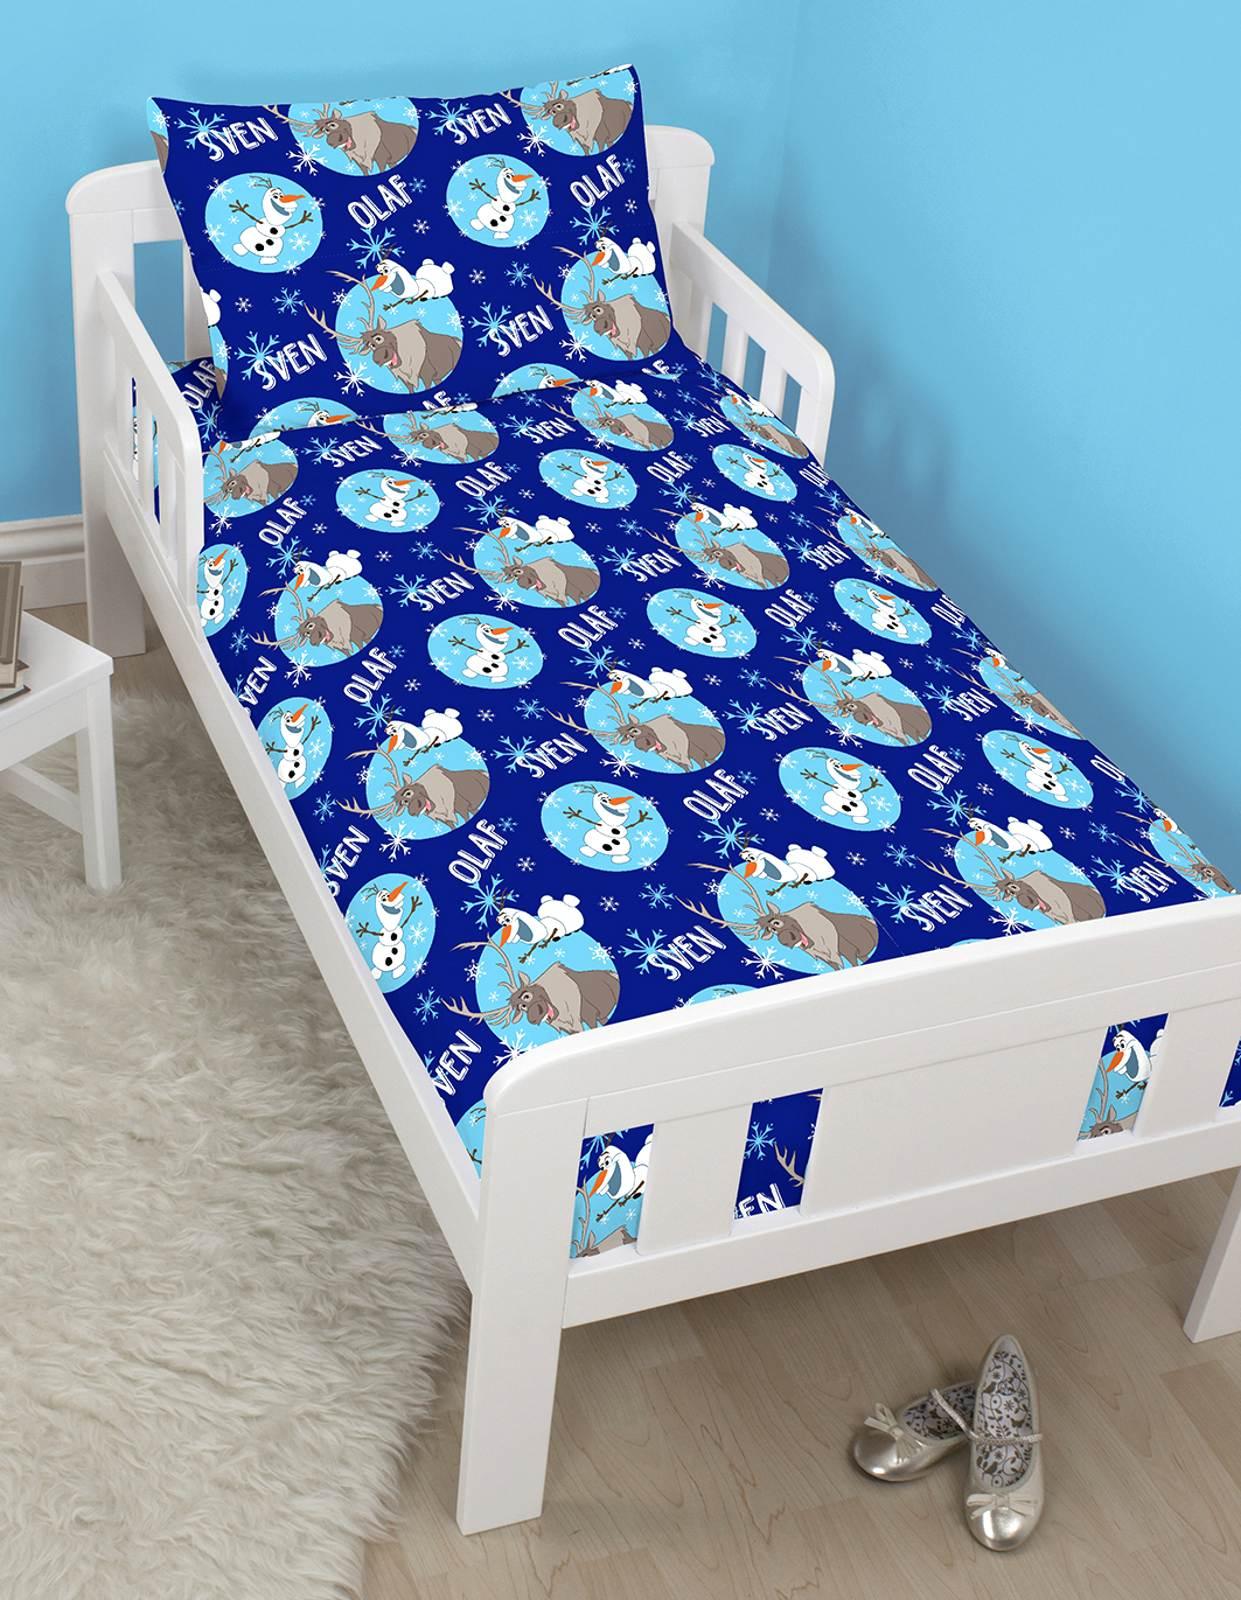 disney frozen kinderbett gr e kleinkind bettdecke. Black Bedroom Furniture Sets. Home Design Ideas